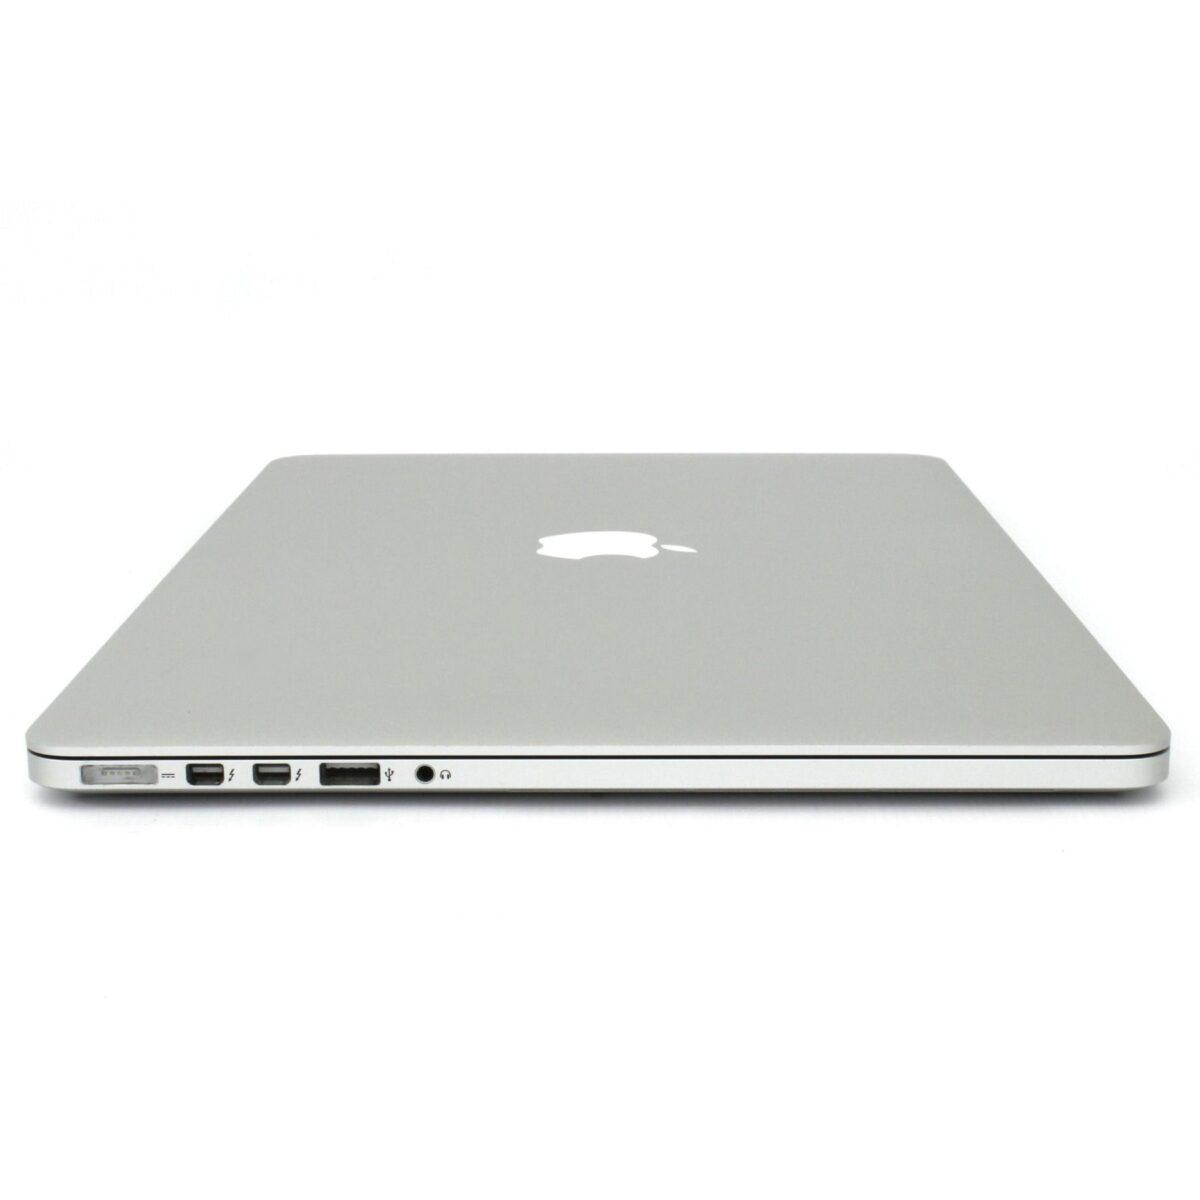 "Retina Apple Macbook Pro 15"" Powerful Core i7 256GB SSD 8GB RAM Mac Laptop OS Catalina"